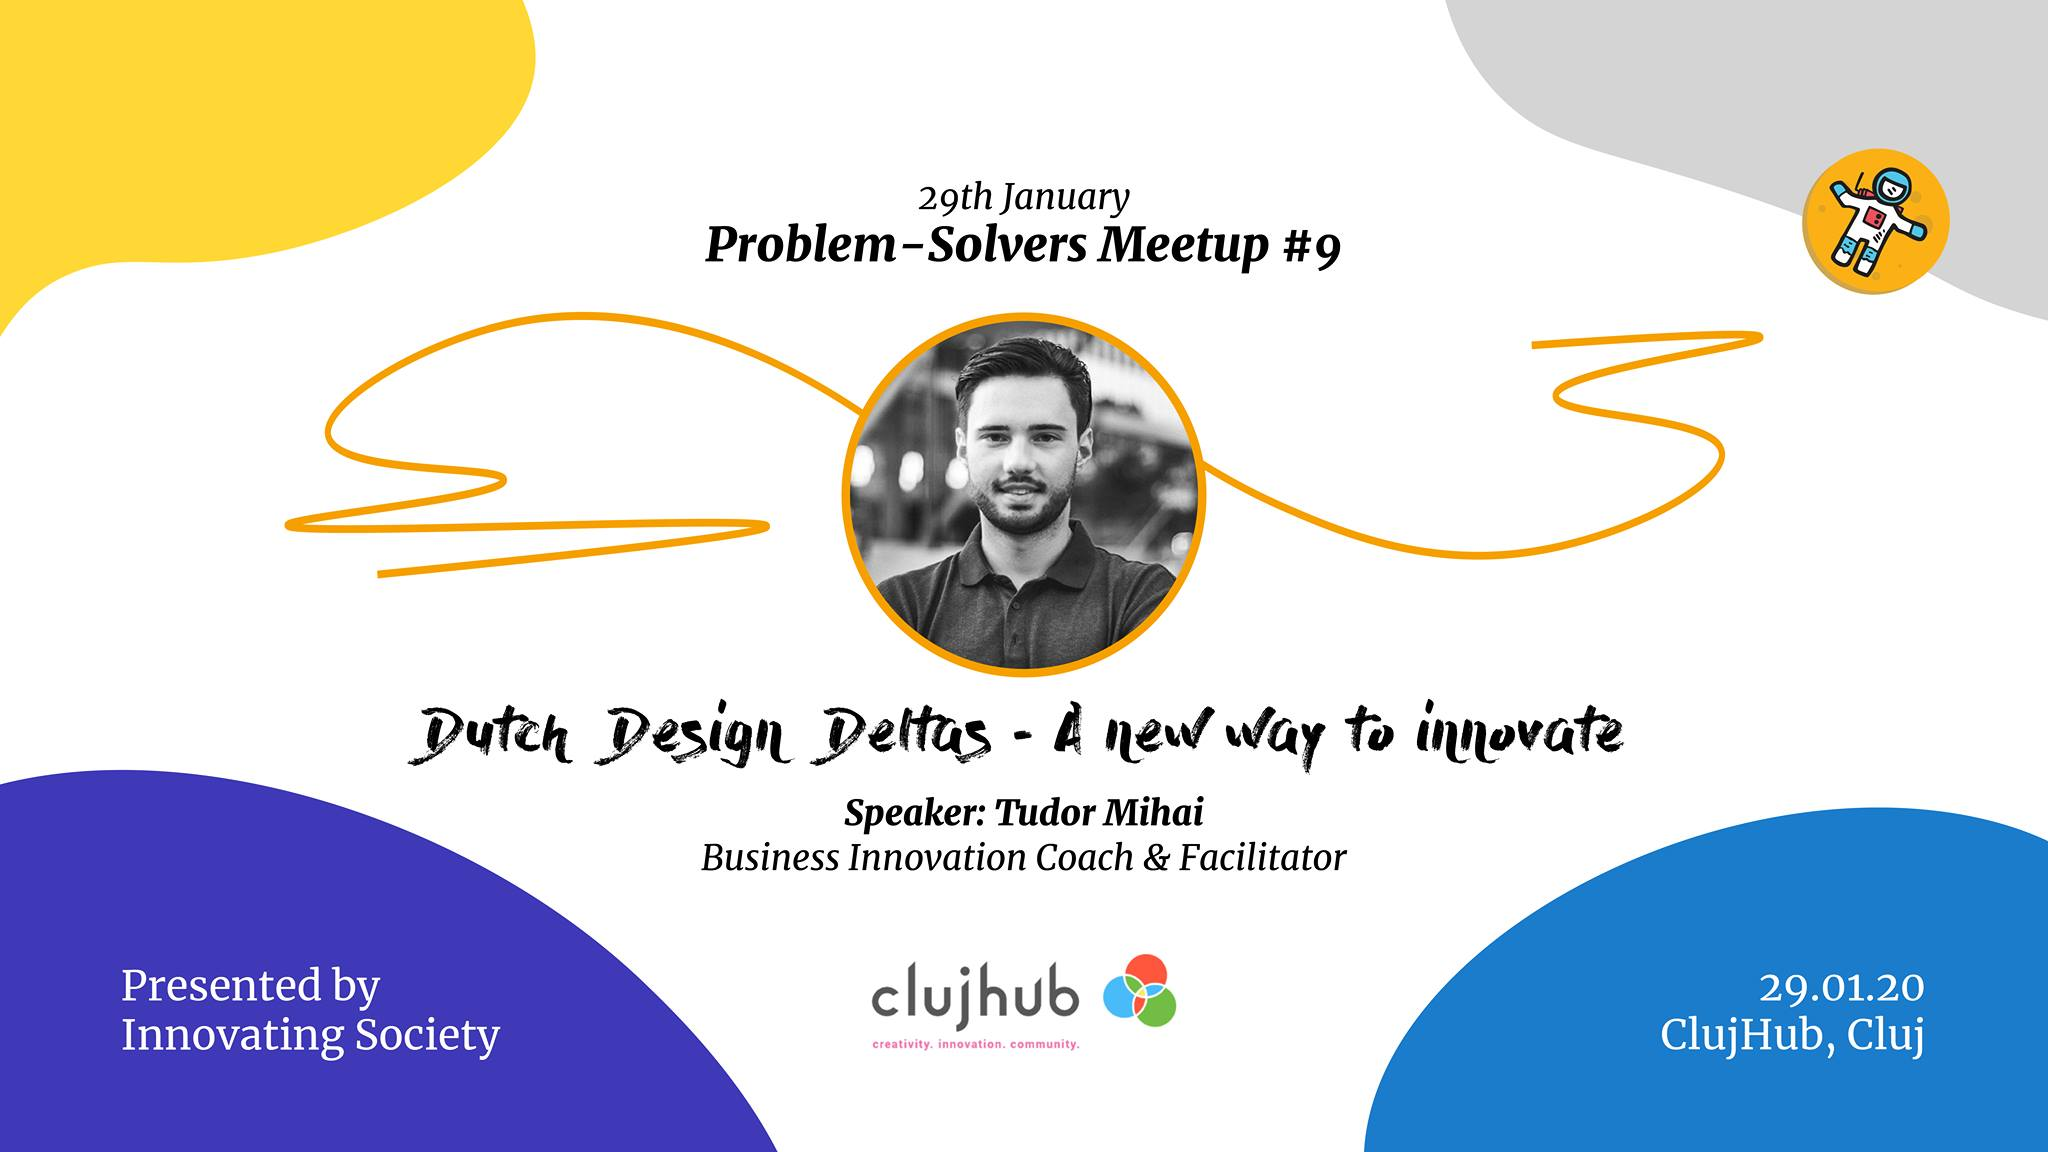 Dutch Design Deltas: A new way to innovate